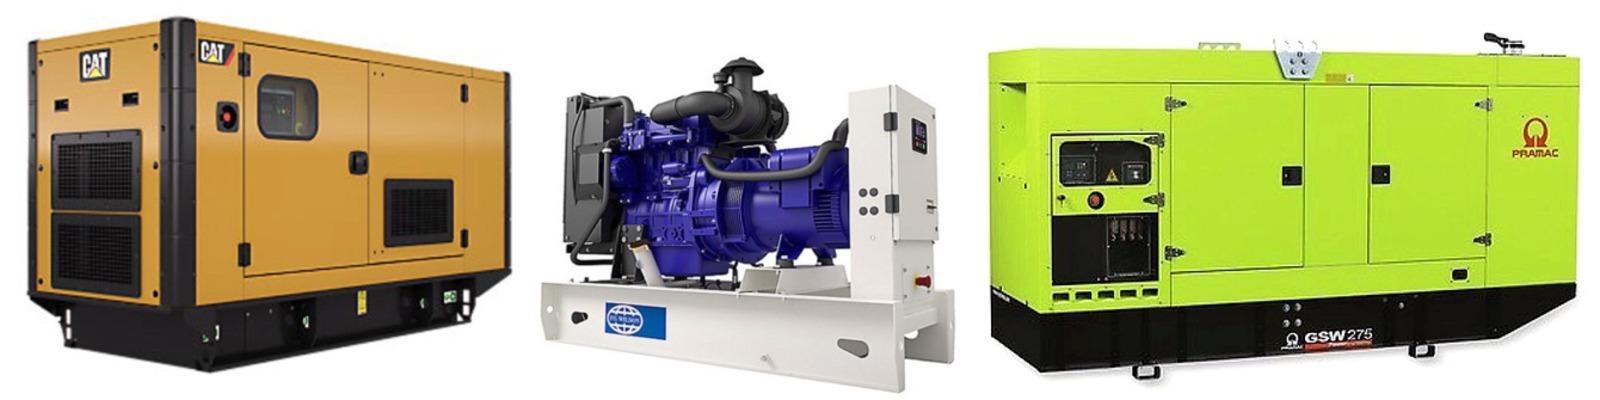 Standby Generators - Standby Diesel Generators